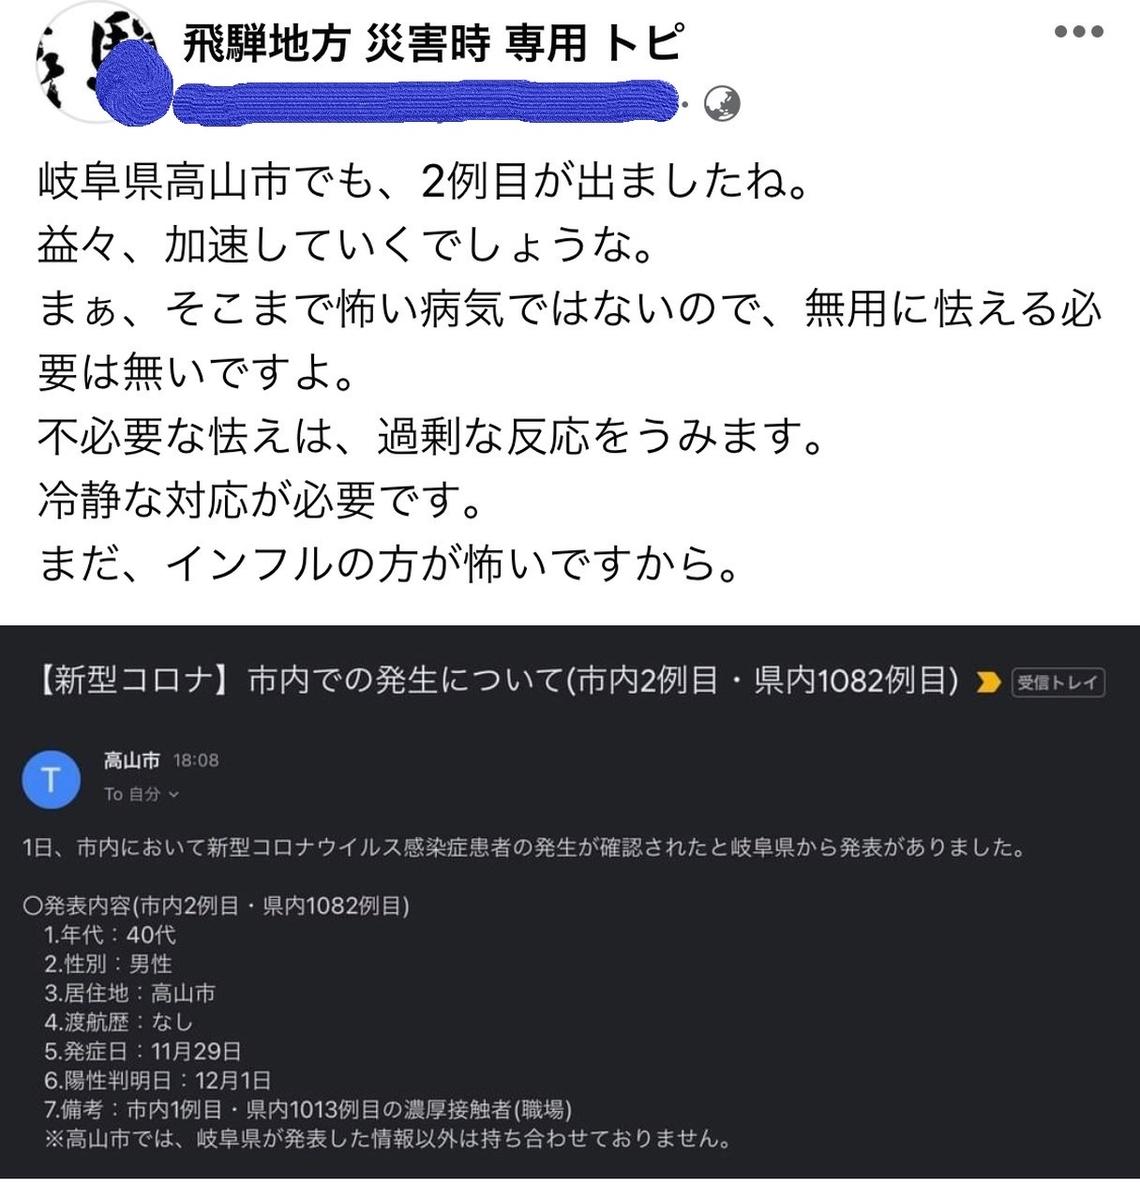 f:id:gk-murai33-gk:20201202120721j:plain